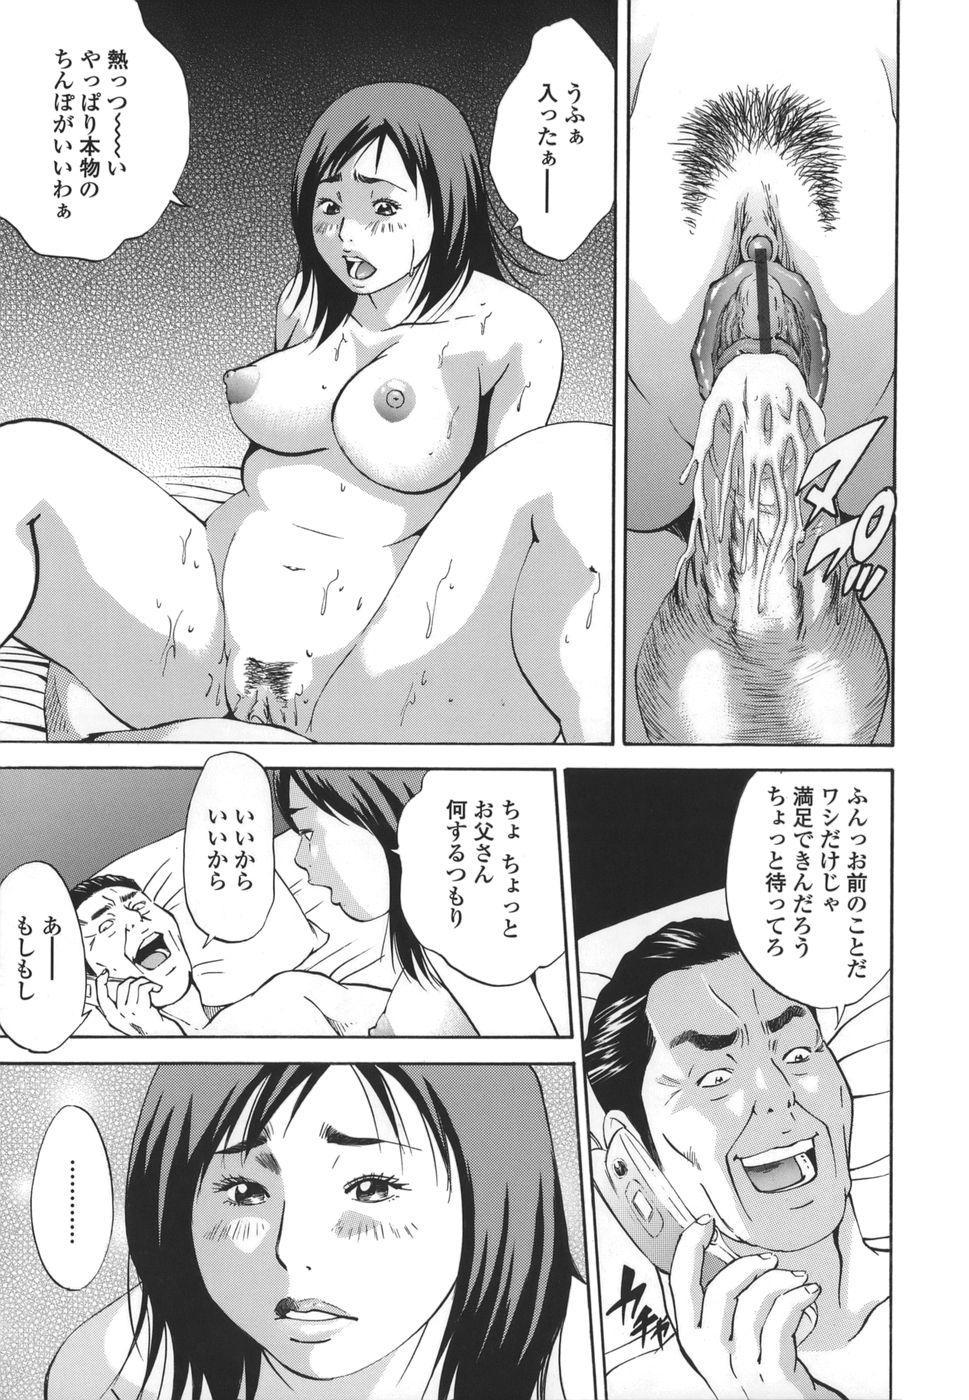 Kinshin Goukan - Near Relation Rapes 54